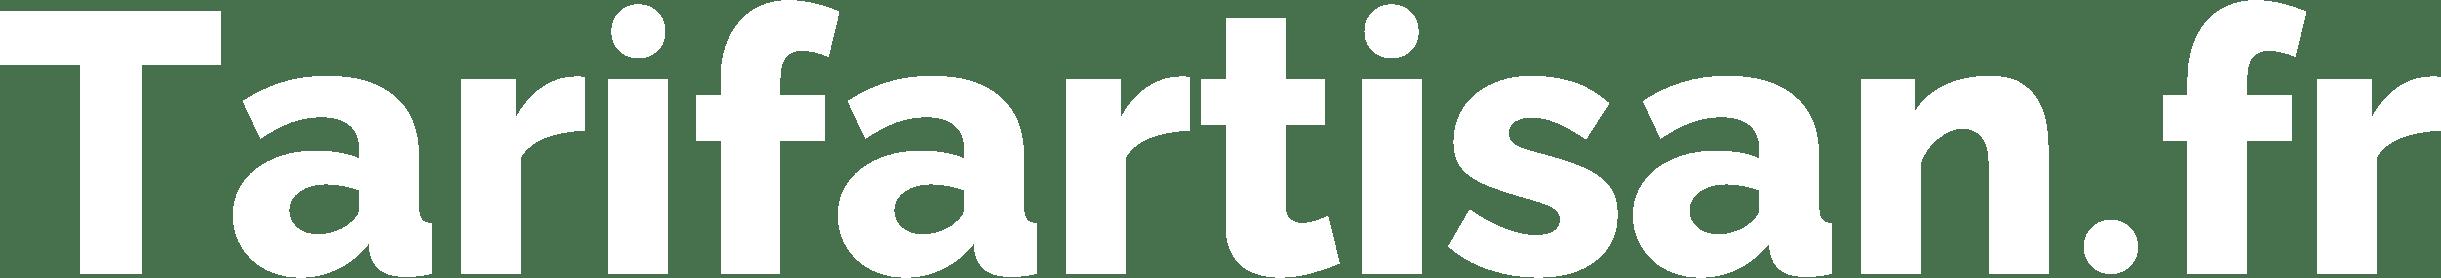 Prix De Pose D Un Carrelage Au M2 Tarif Carreleur Tarifartisan Fr